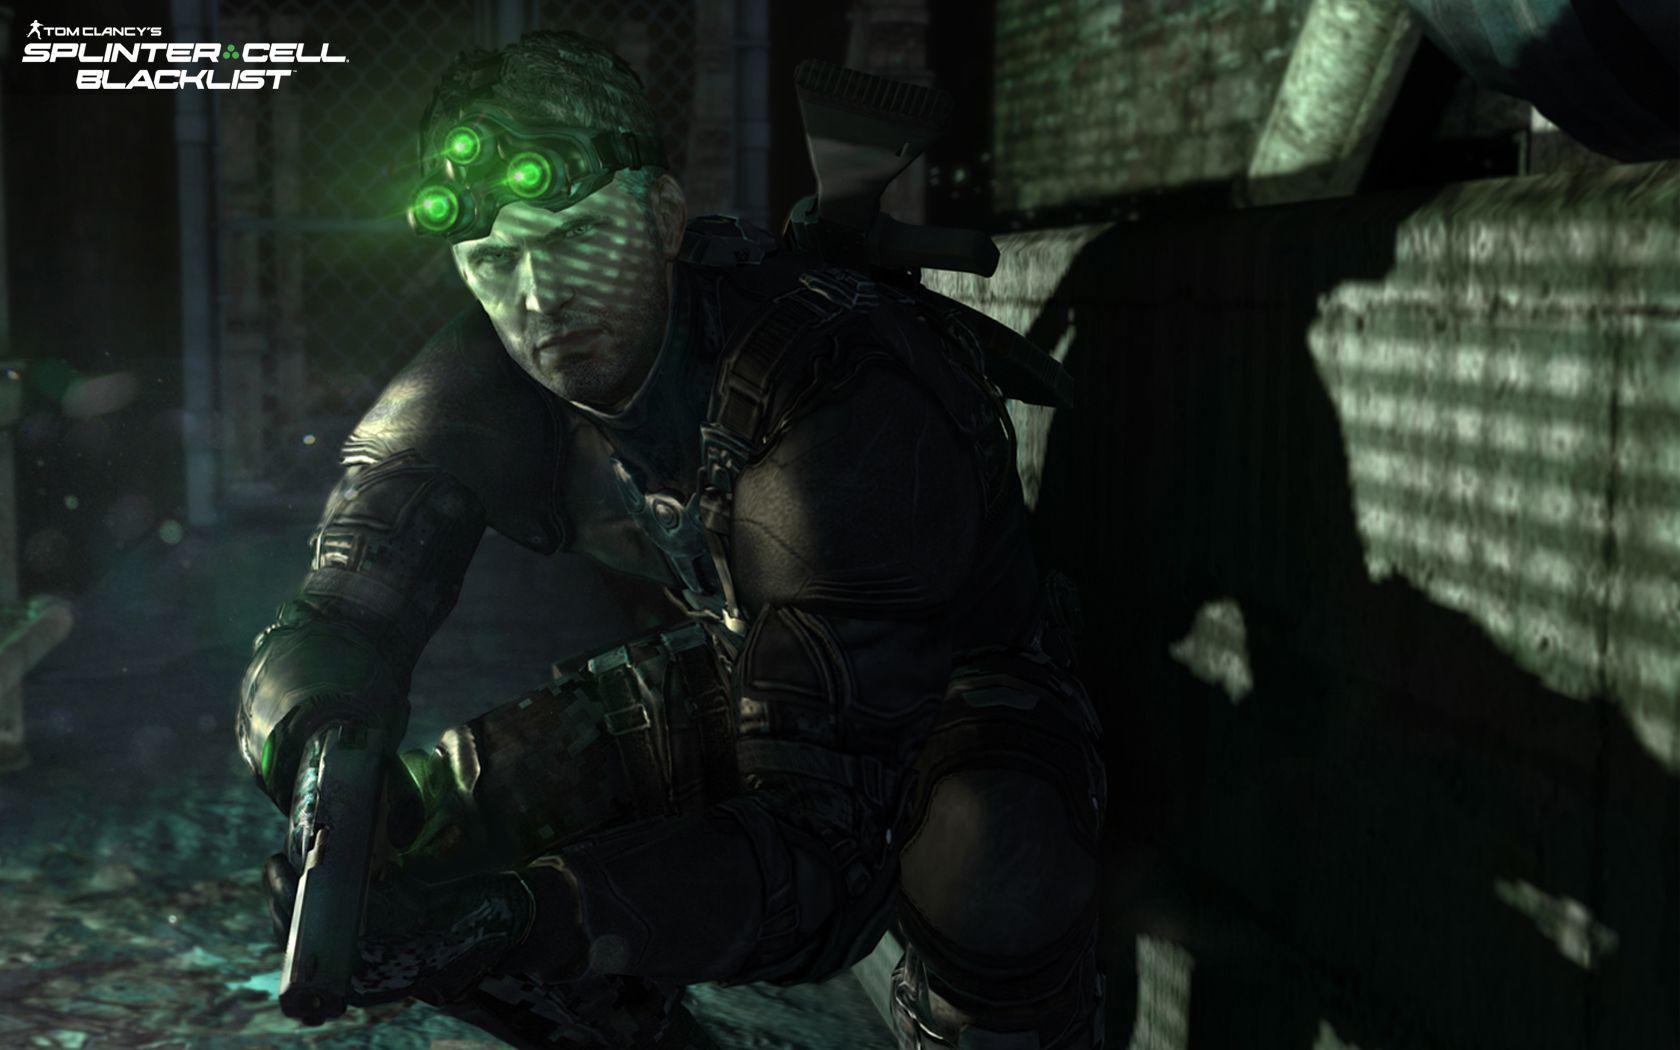 splinter cell blacklist | gamer | pinterest | assassins creed and